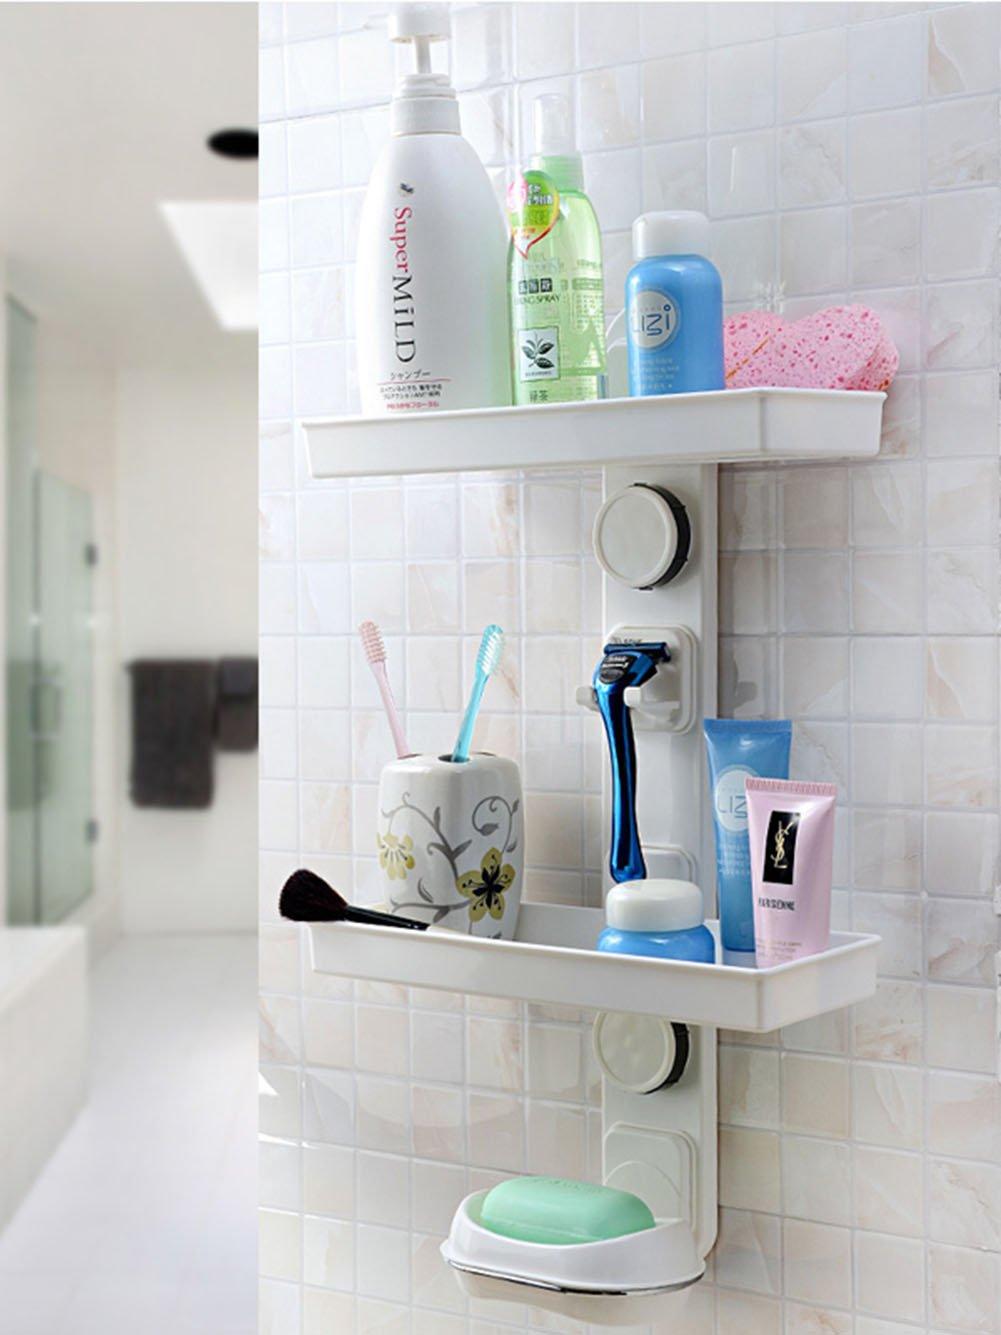 Accessoire Salle De Bain Bebe ~ accessoires salle de bain ventouse amazon fr